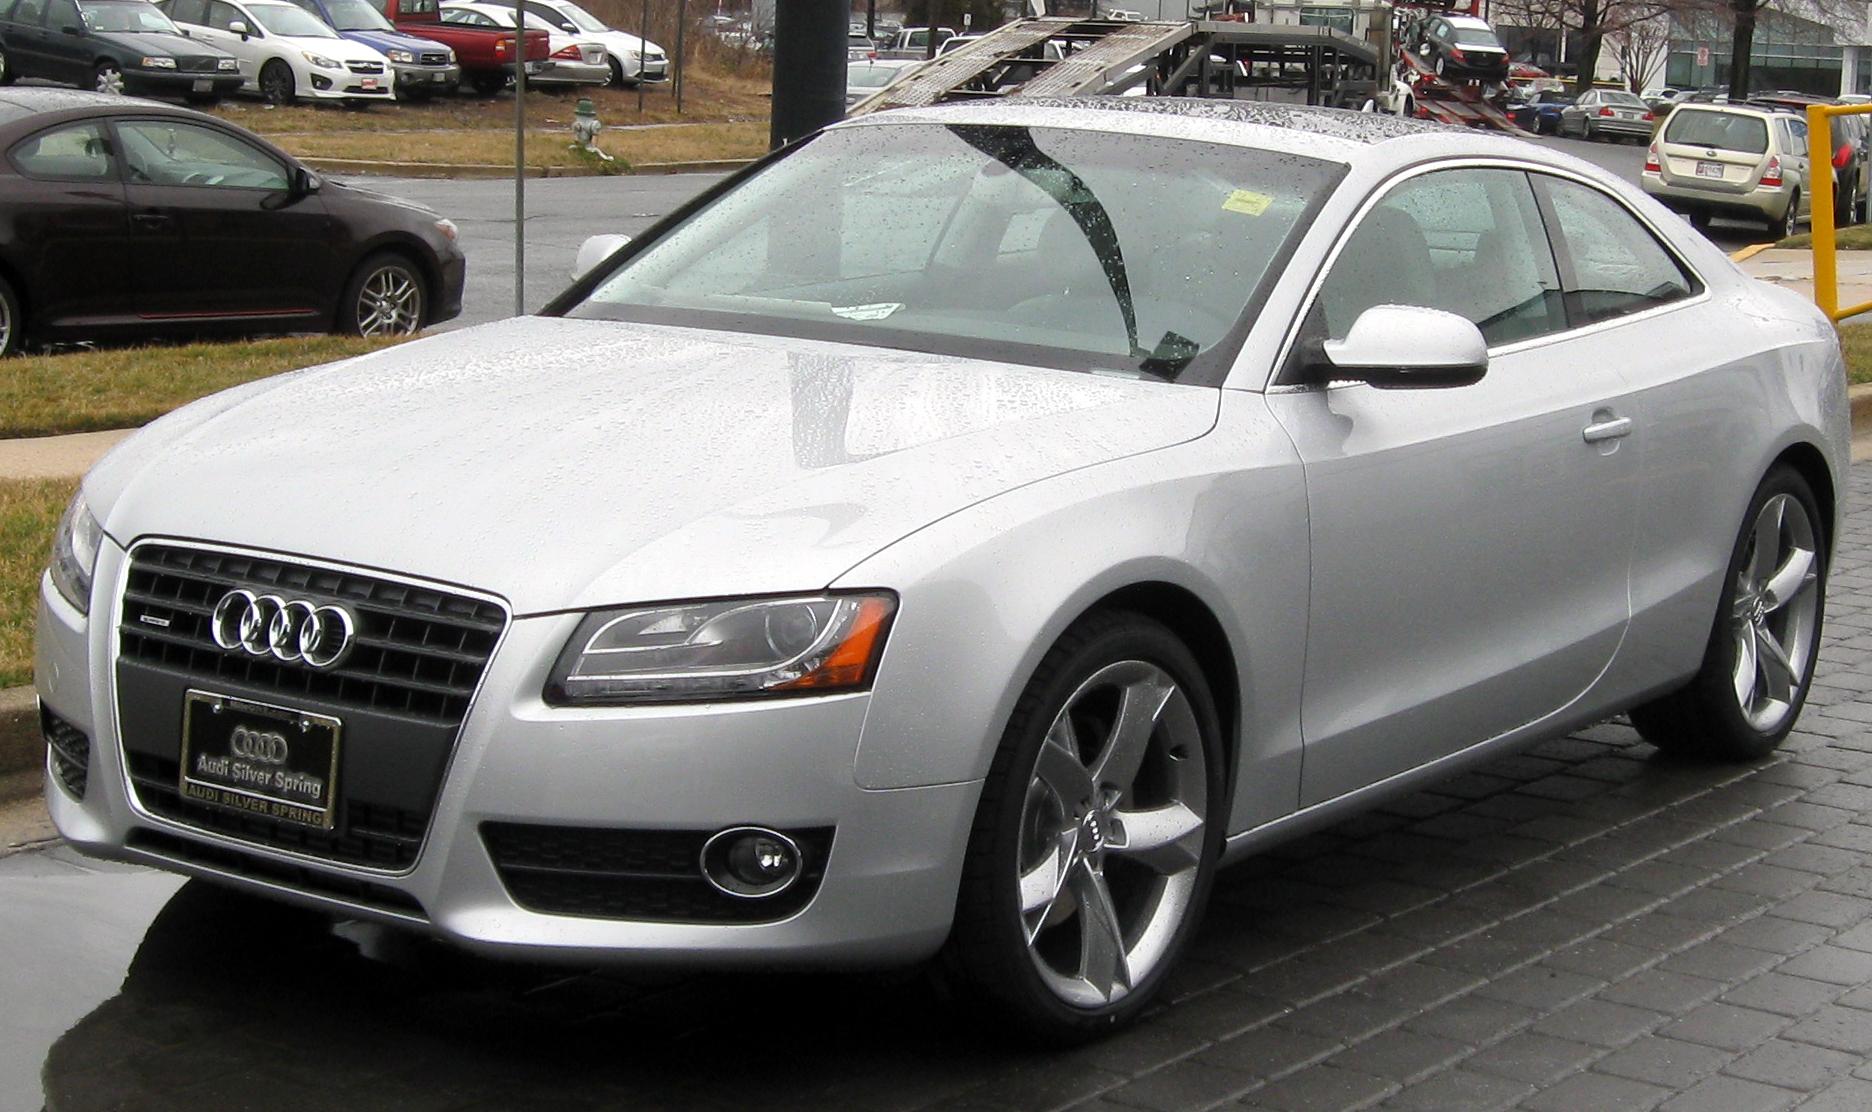 2012 Audi A5 Dimensions Upcomingcarshq Com